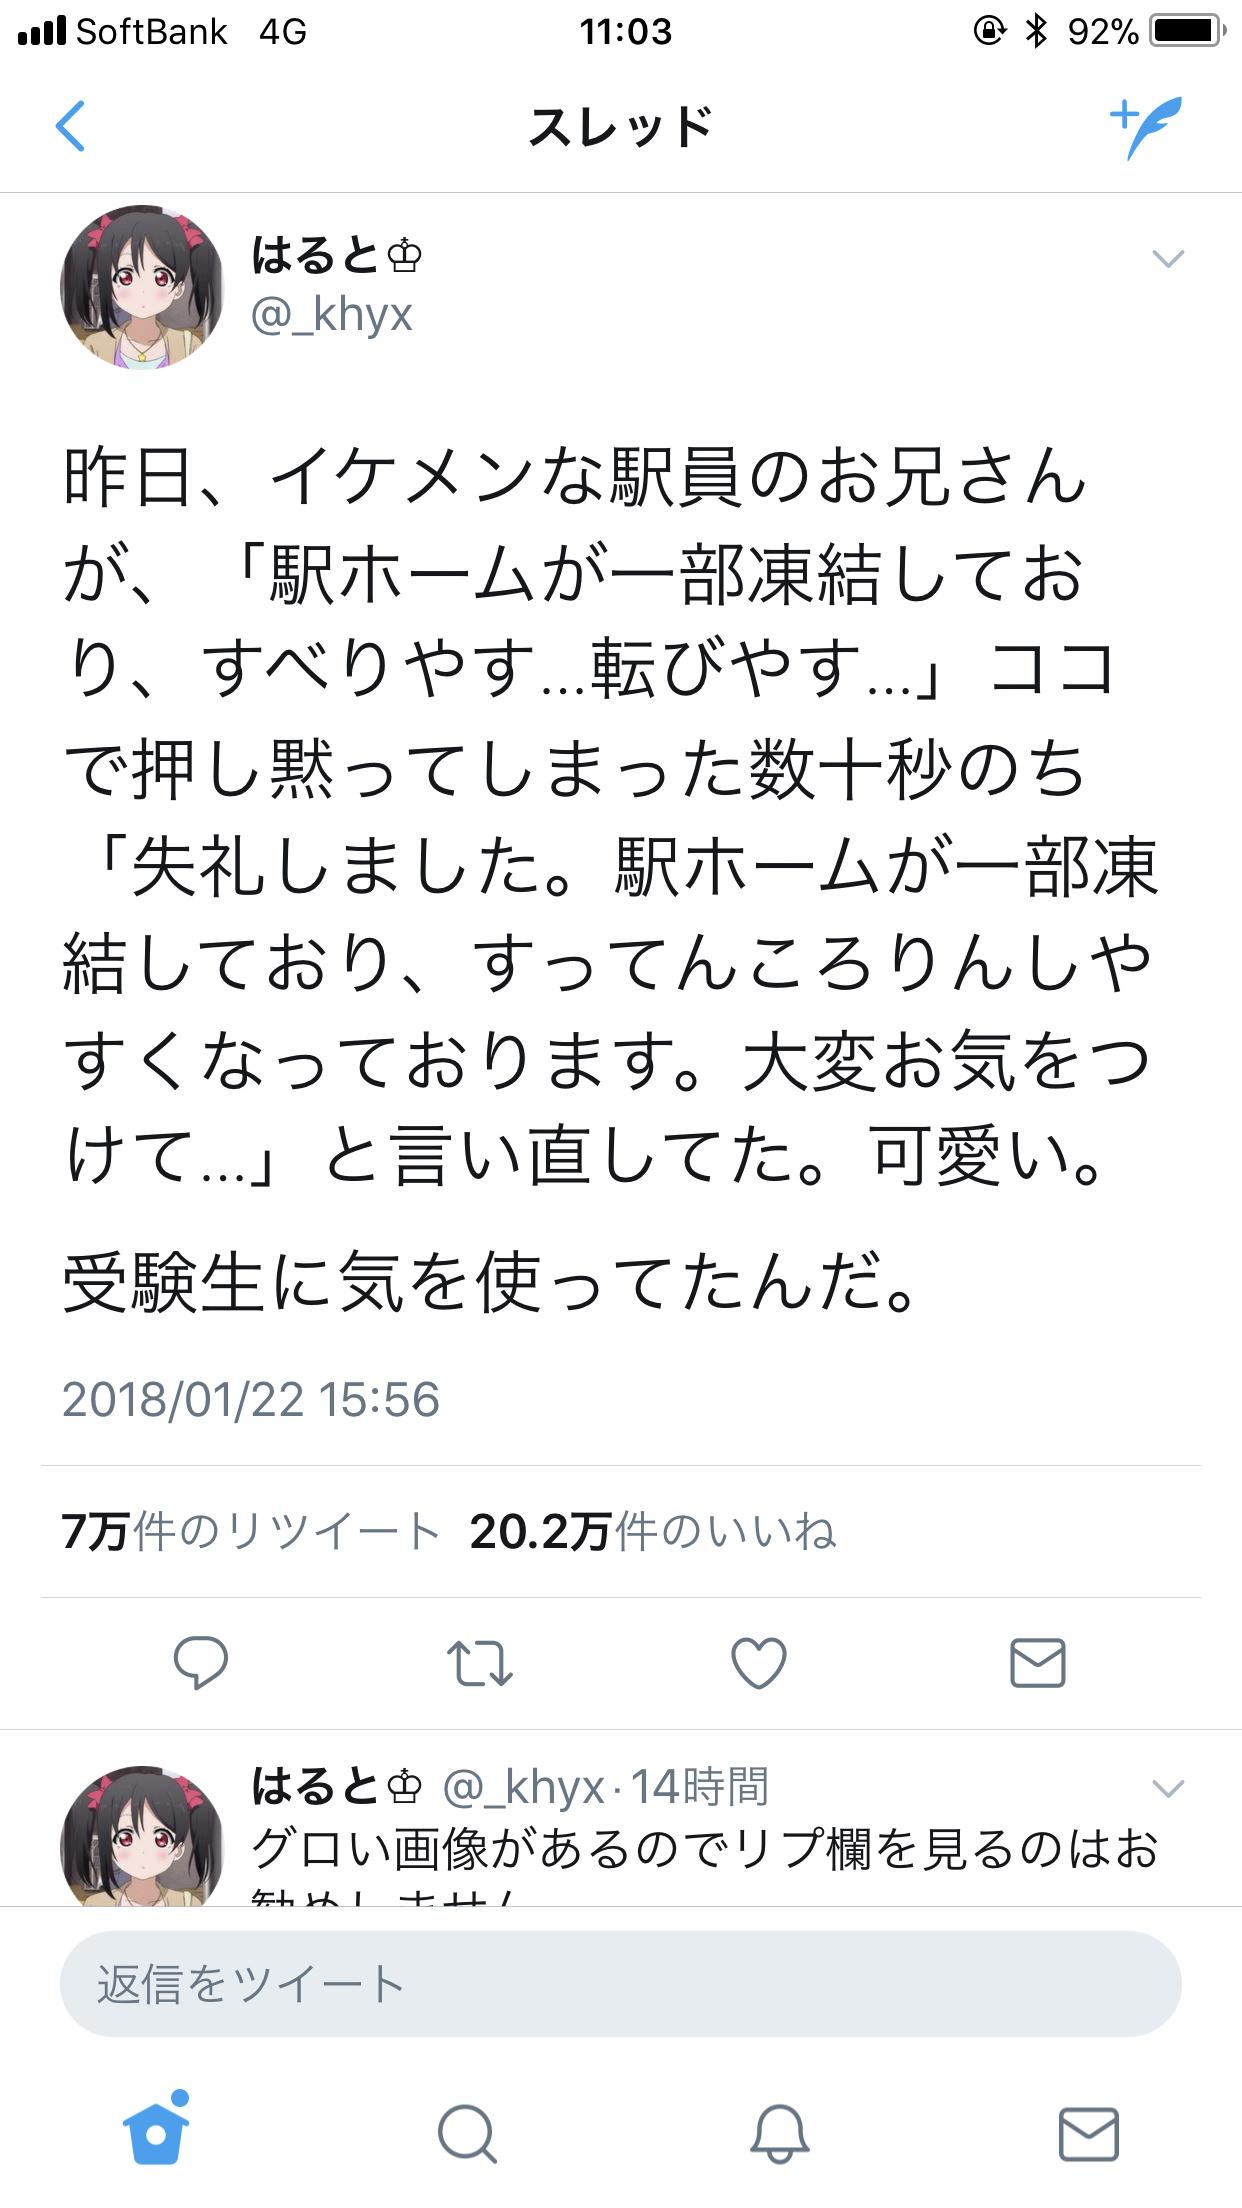 Twitter「昨日、イケメンな駅員さんのアナウンスが可愛かった!」←20万いいね